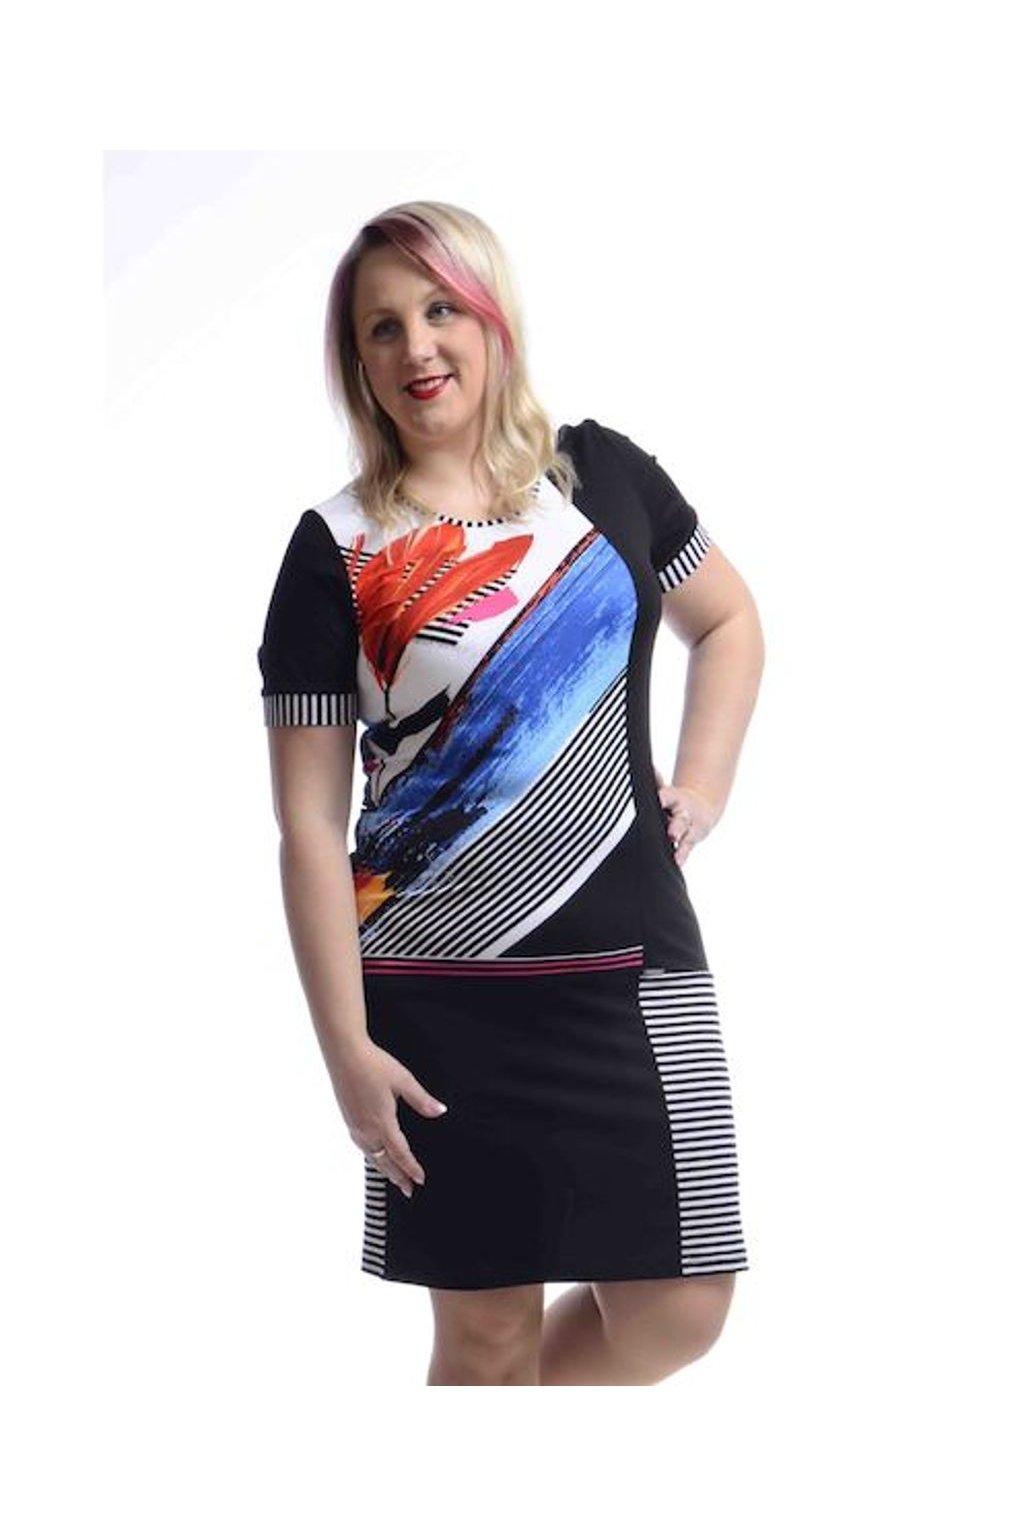 5320 Šaty proužek lemy (Velikost 36, Barva Vzorovaná)